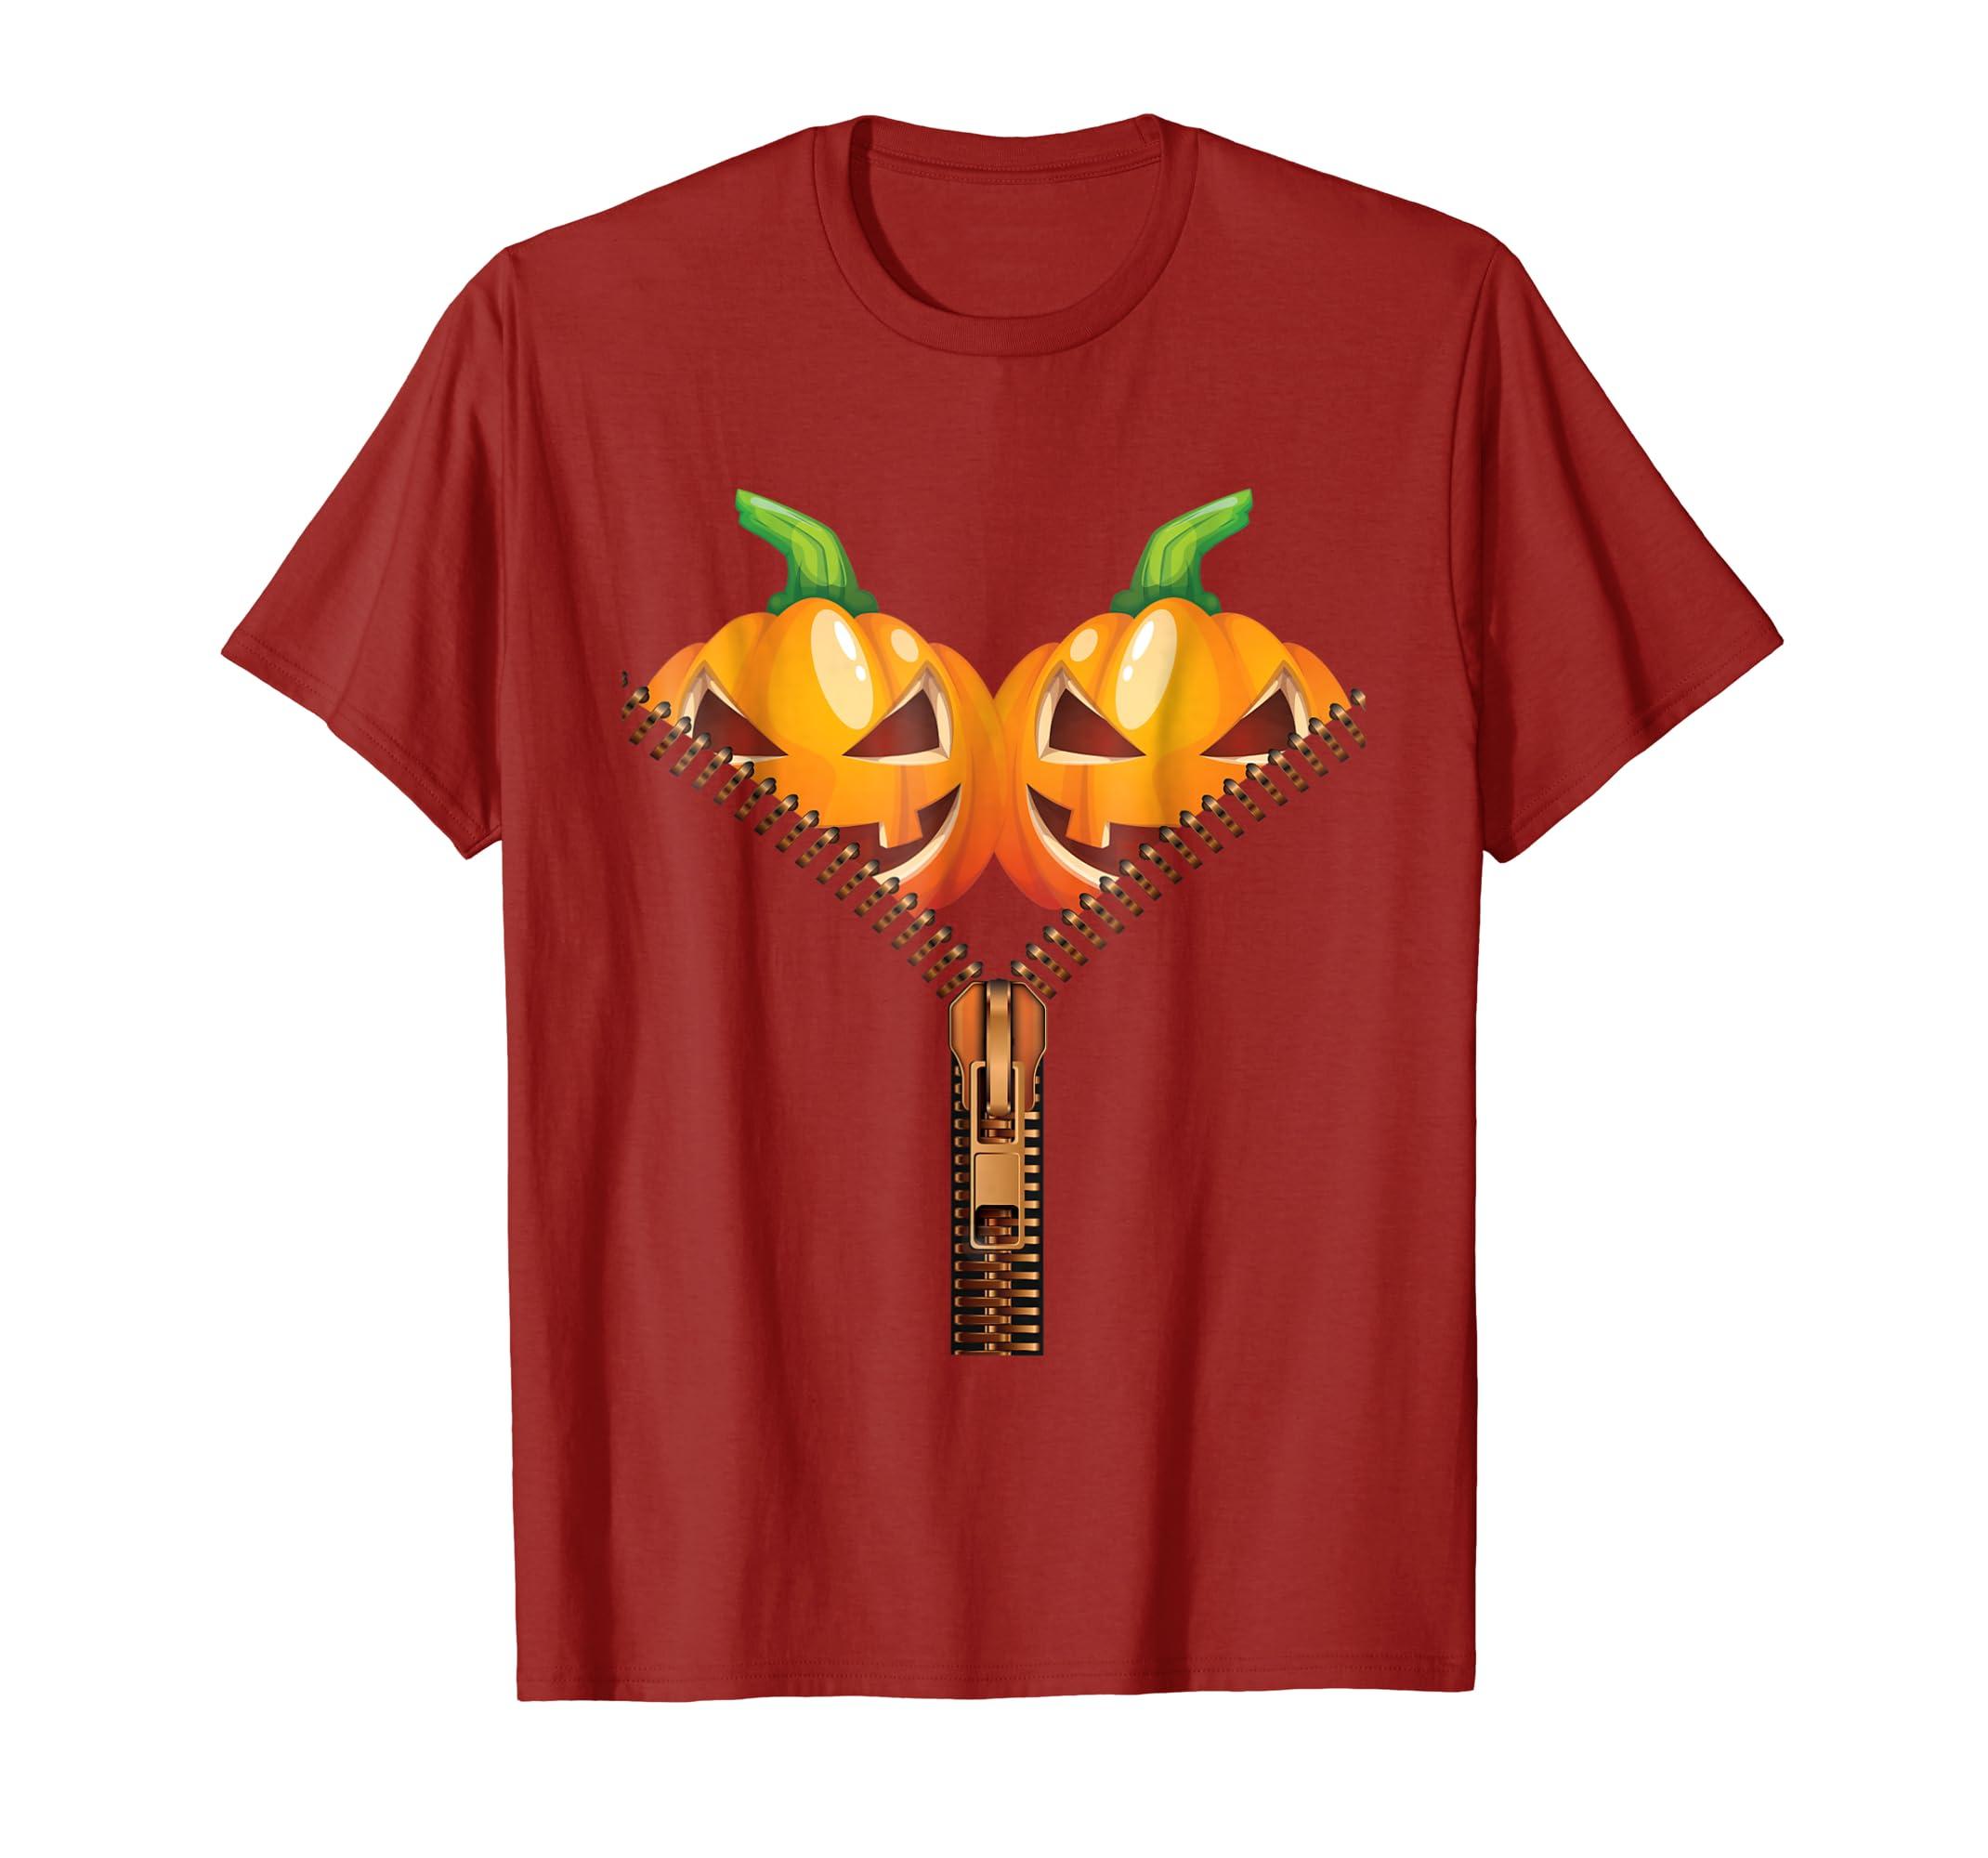 484f836db Amazon.com: Pumpkin BOObs T-Shirt Womens Funny Halloween Costume Tee:  Clothing